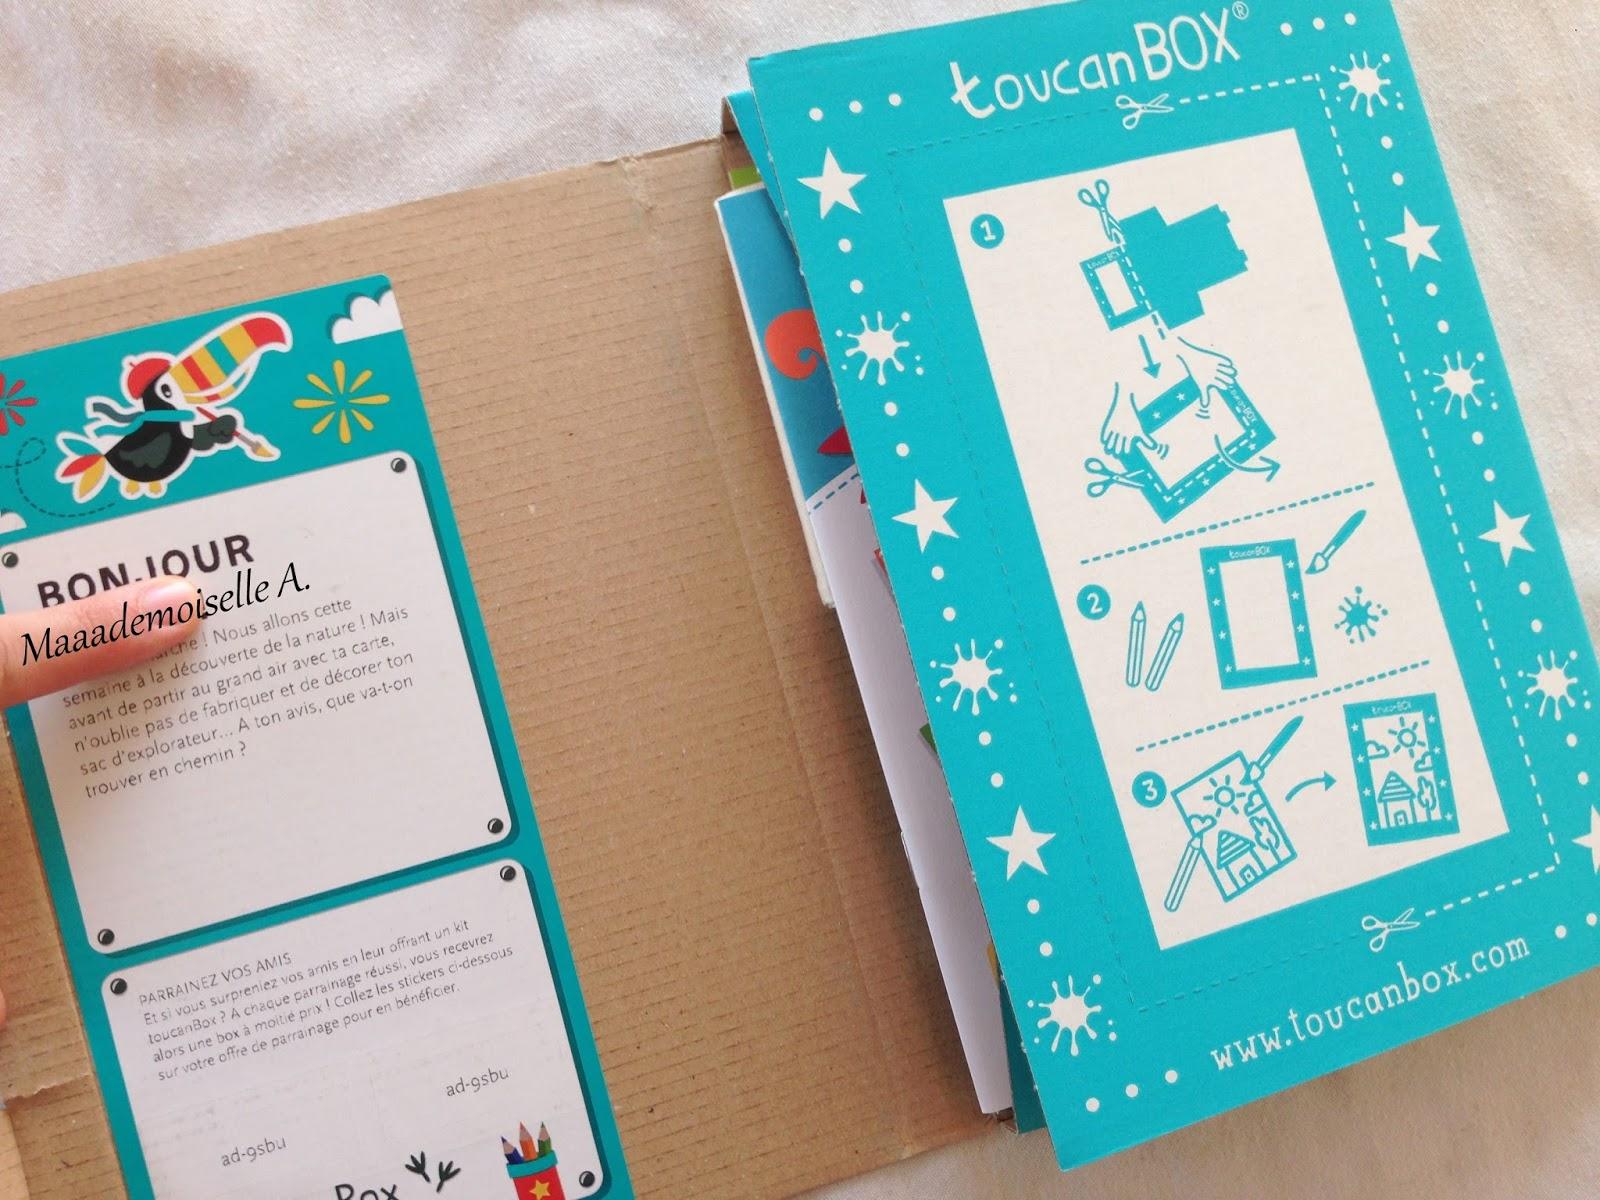 Maaademoiselle A Kit Créatif Toucanbox Le Sac Dexplorateur